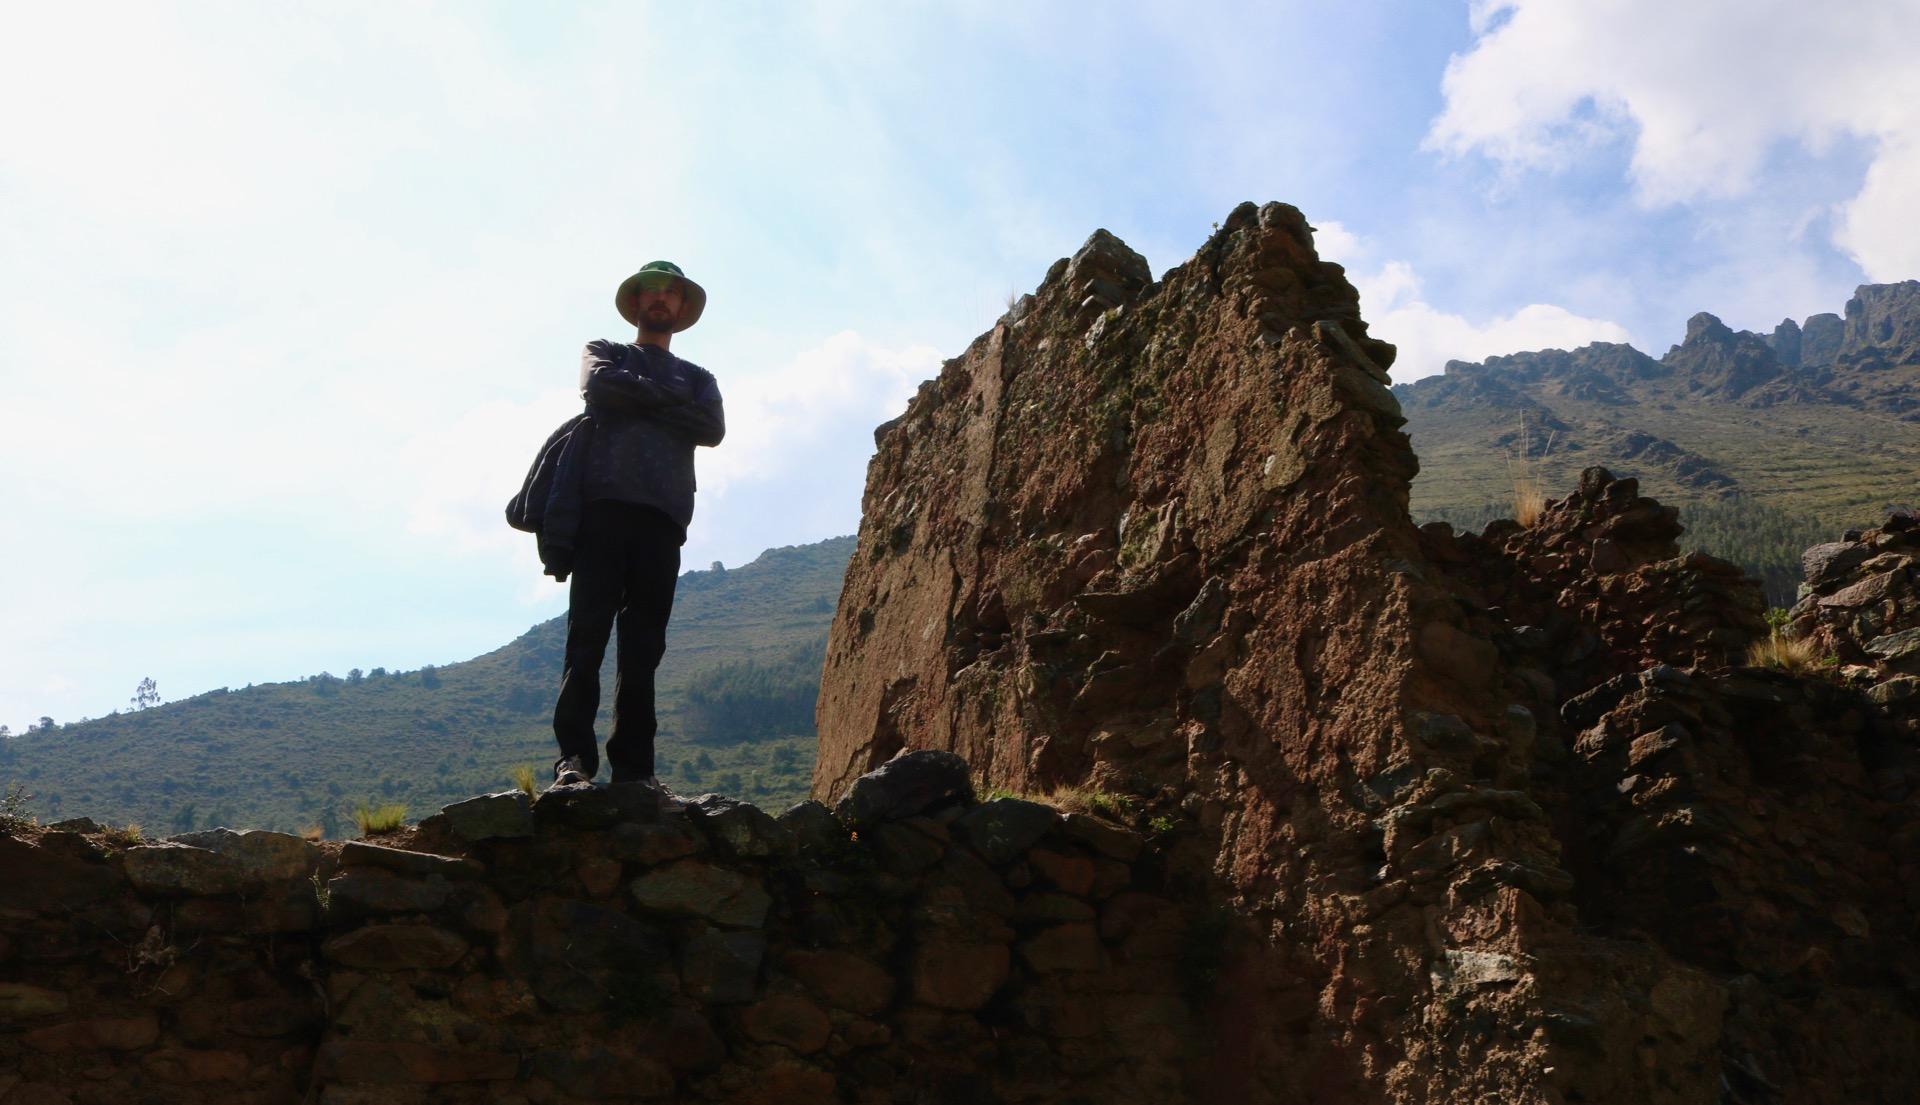 Pumamarca Day Hike from Ollantaytambo -